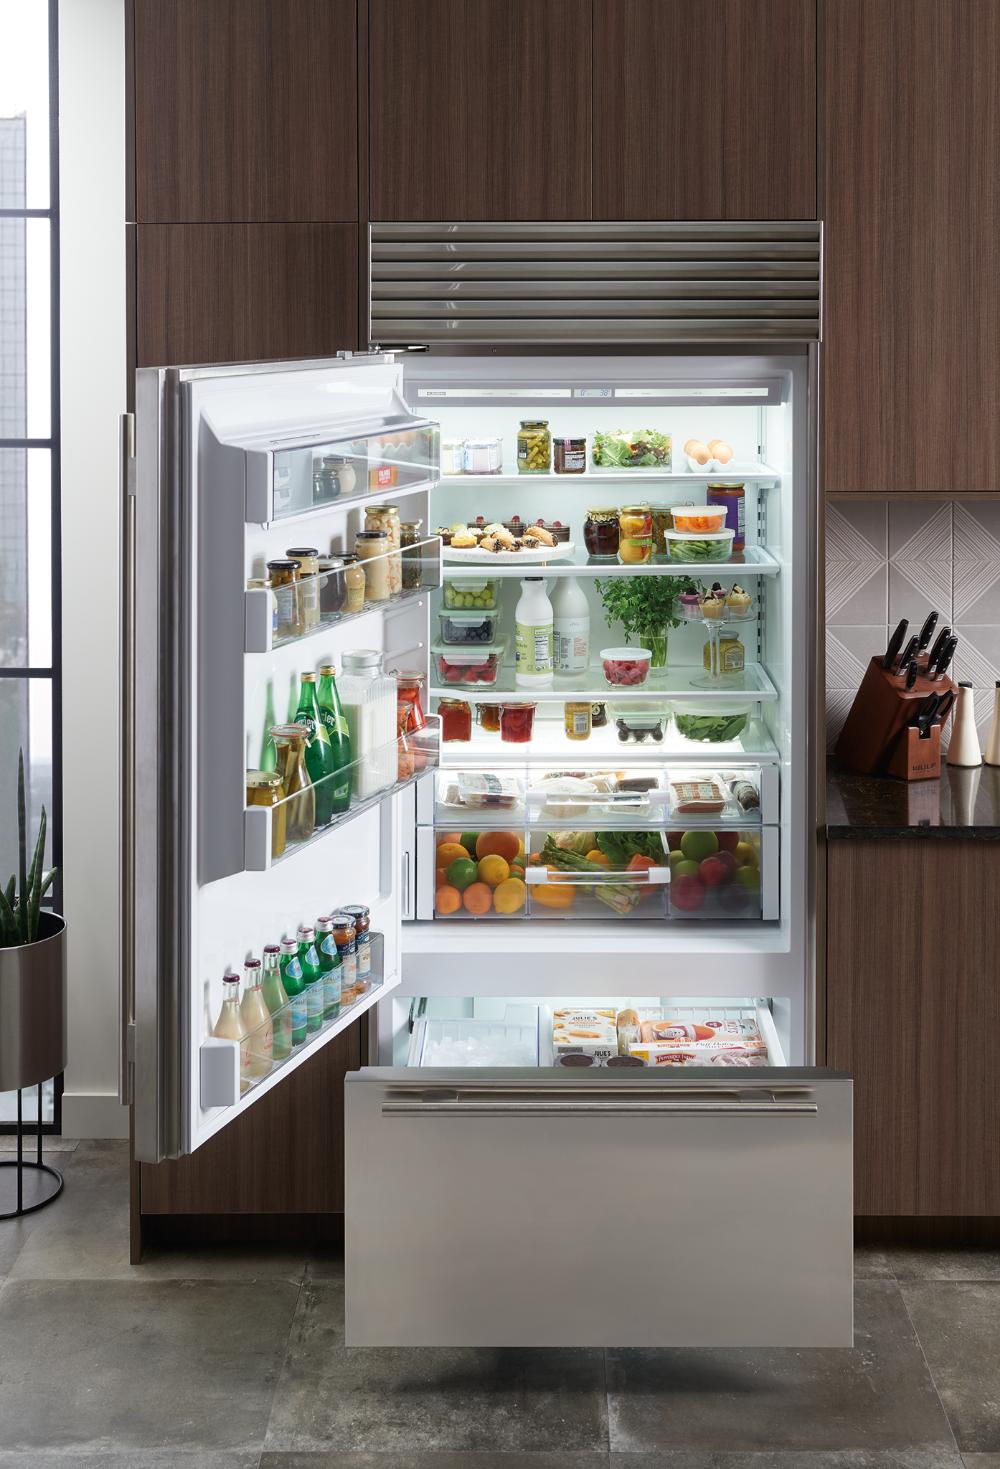 36 Classic Over And Under Refrigerator Freezer With Internal Dispenser Refrigerator Freezer Refrigerator Sub Zero